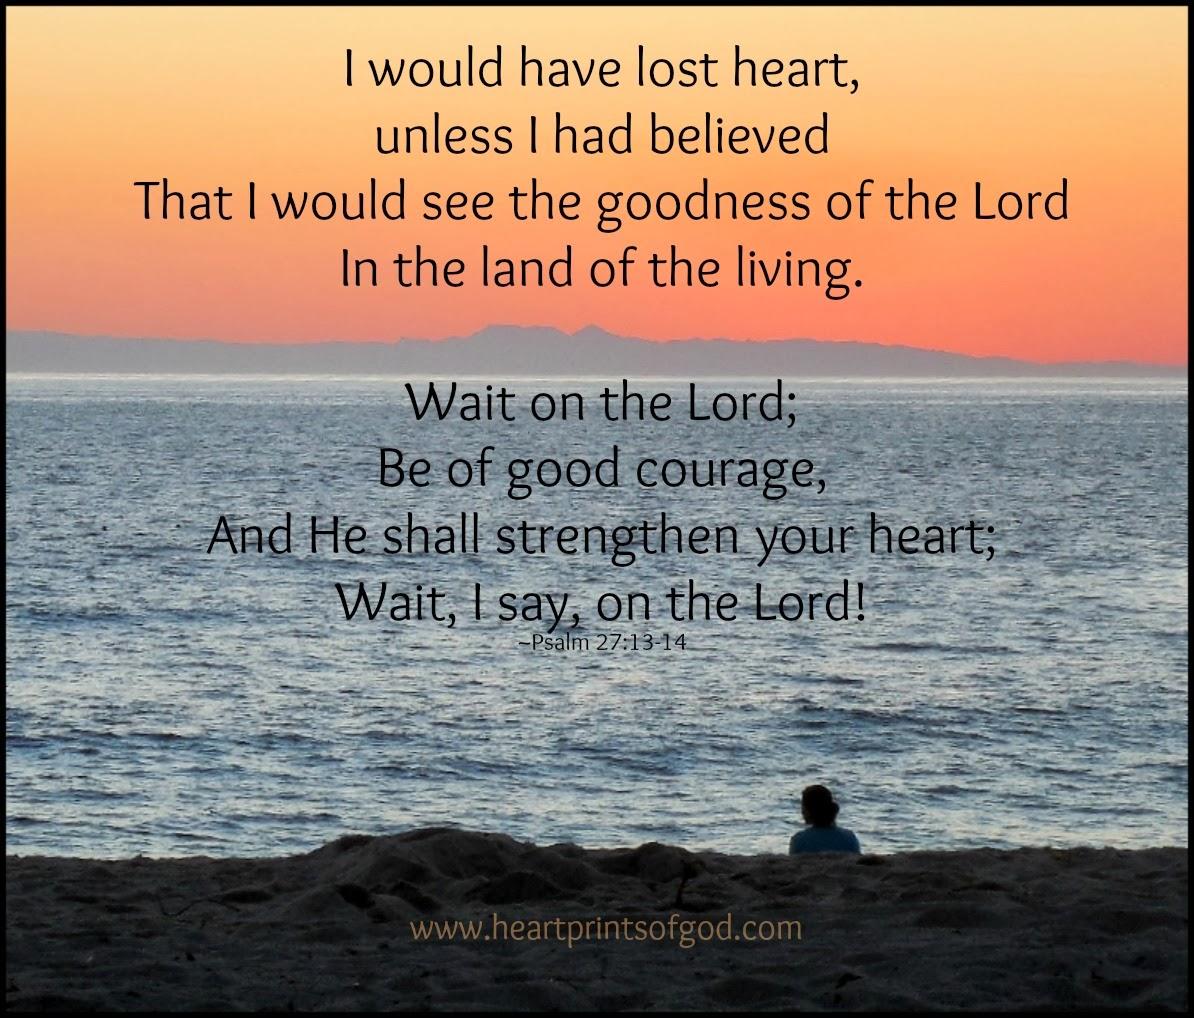 Heartprints Of God: When Your Heart Needs A Boost~